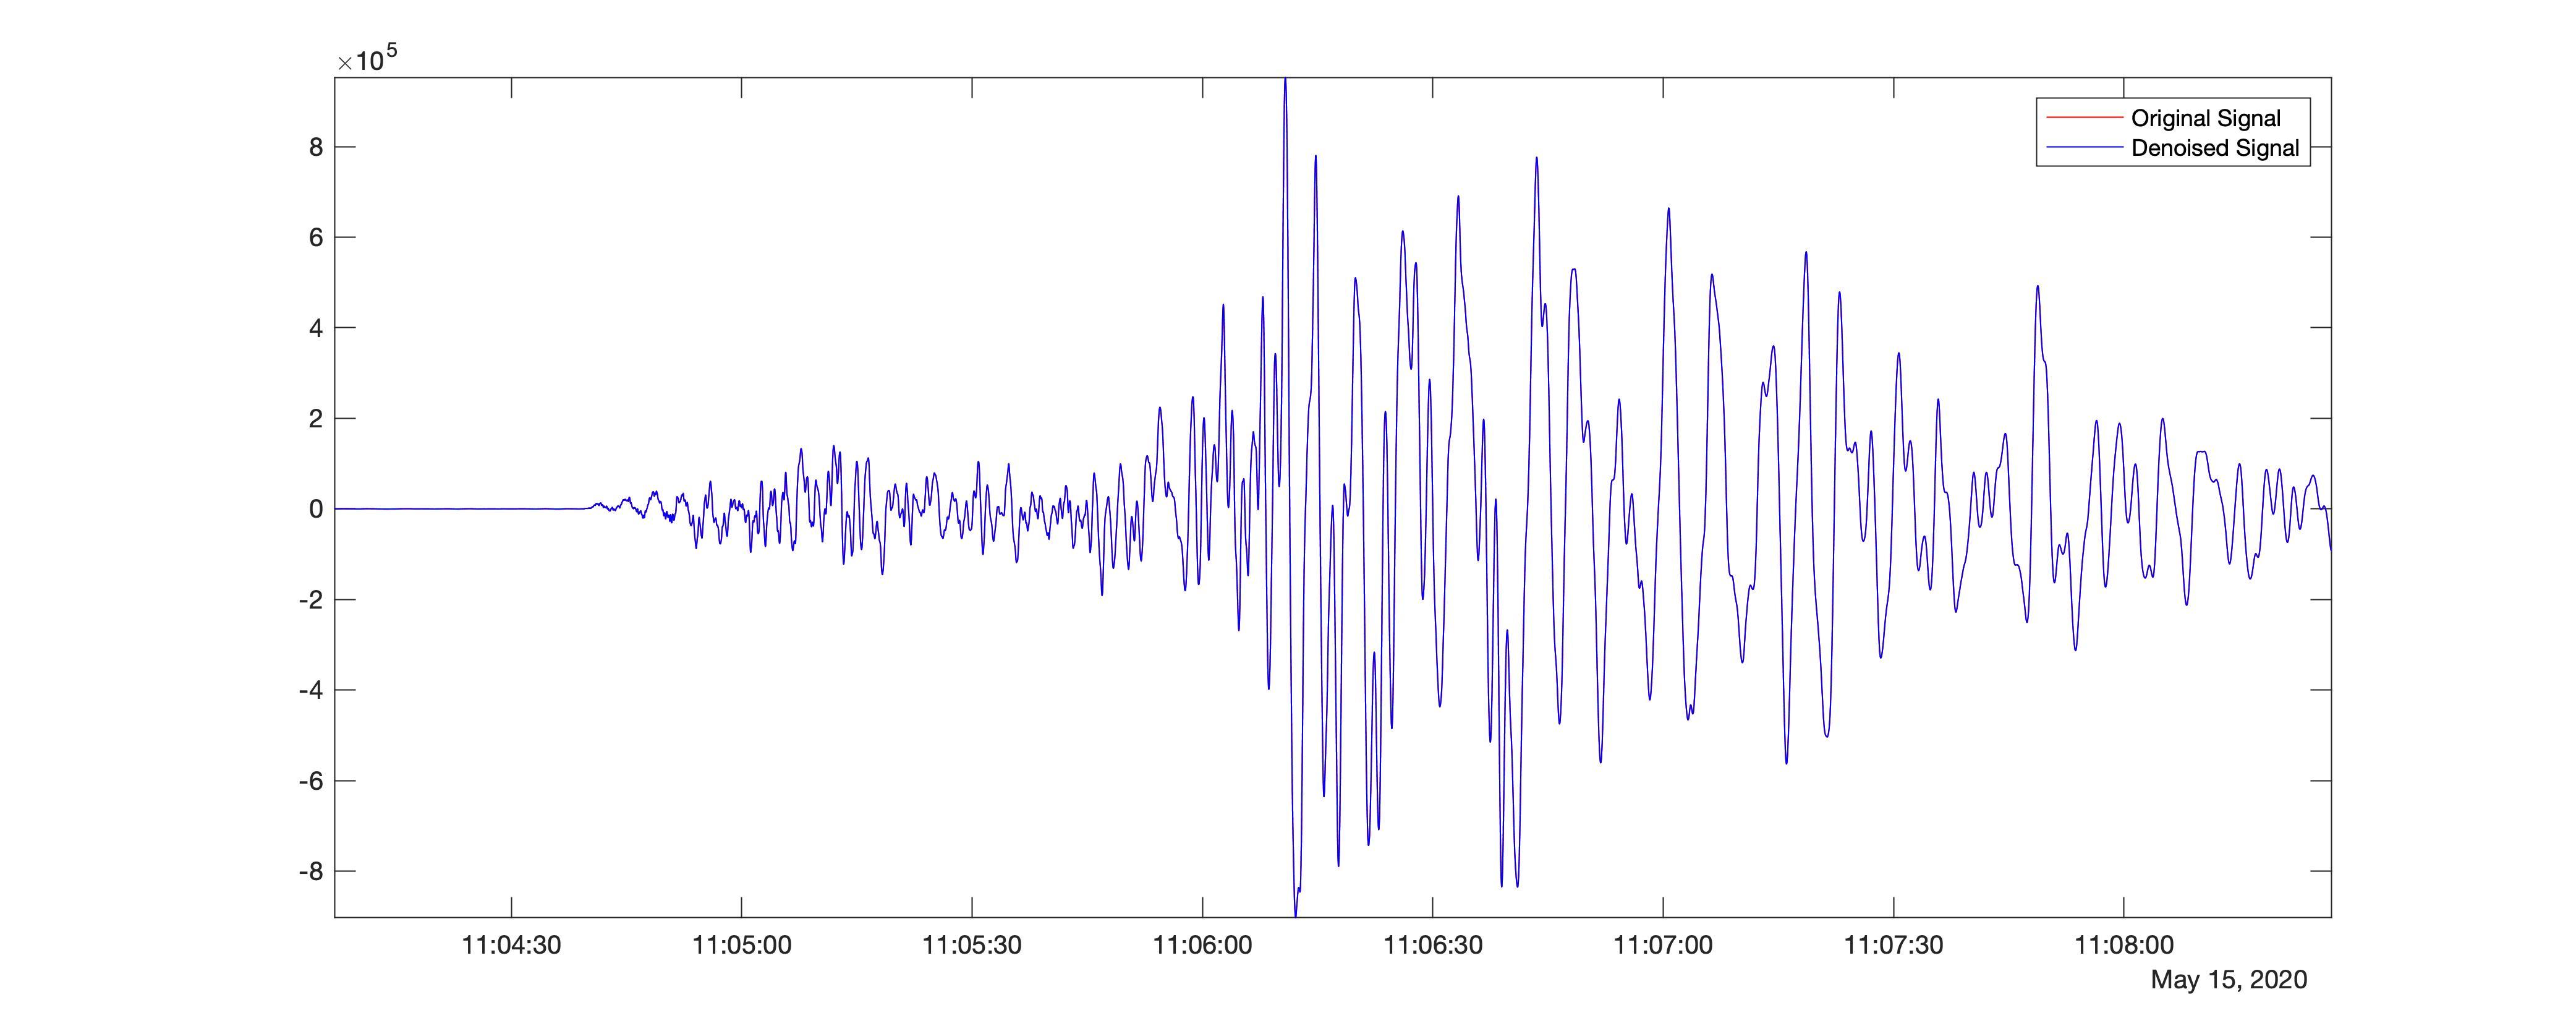 Denoised seismic time-series using sym4